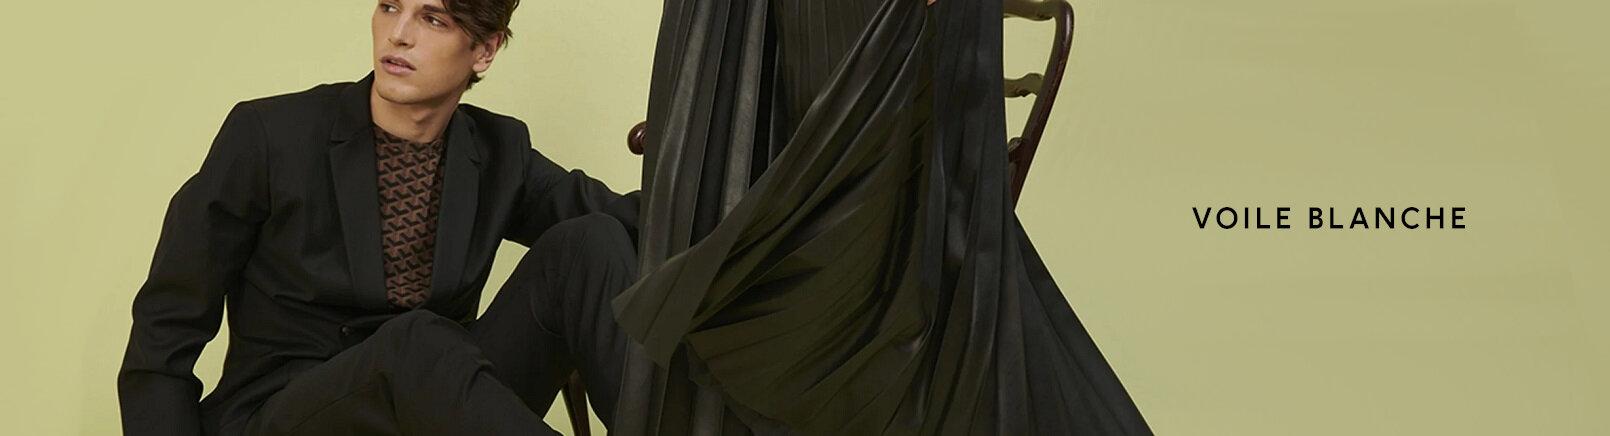 Prange: Voile Blanche Damenschuhe online shoppen